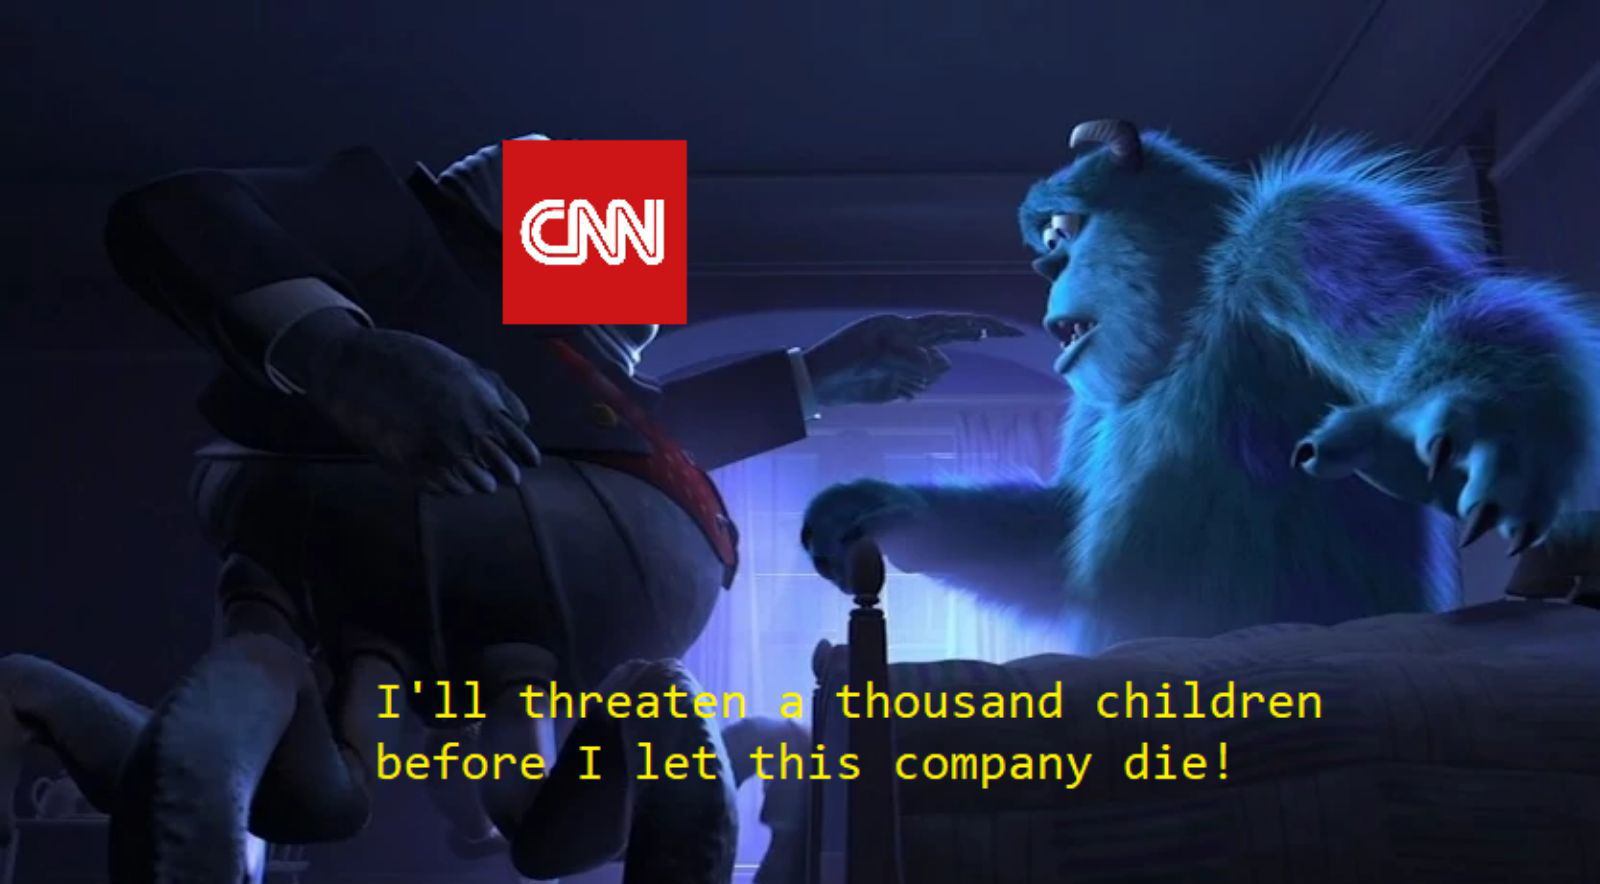 Clinton News Network - meme